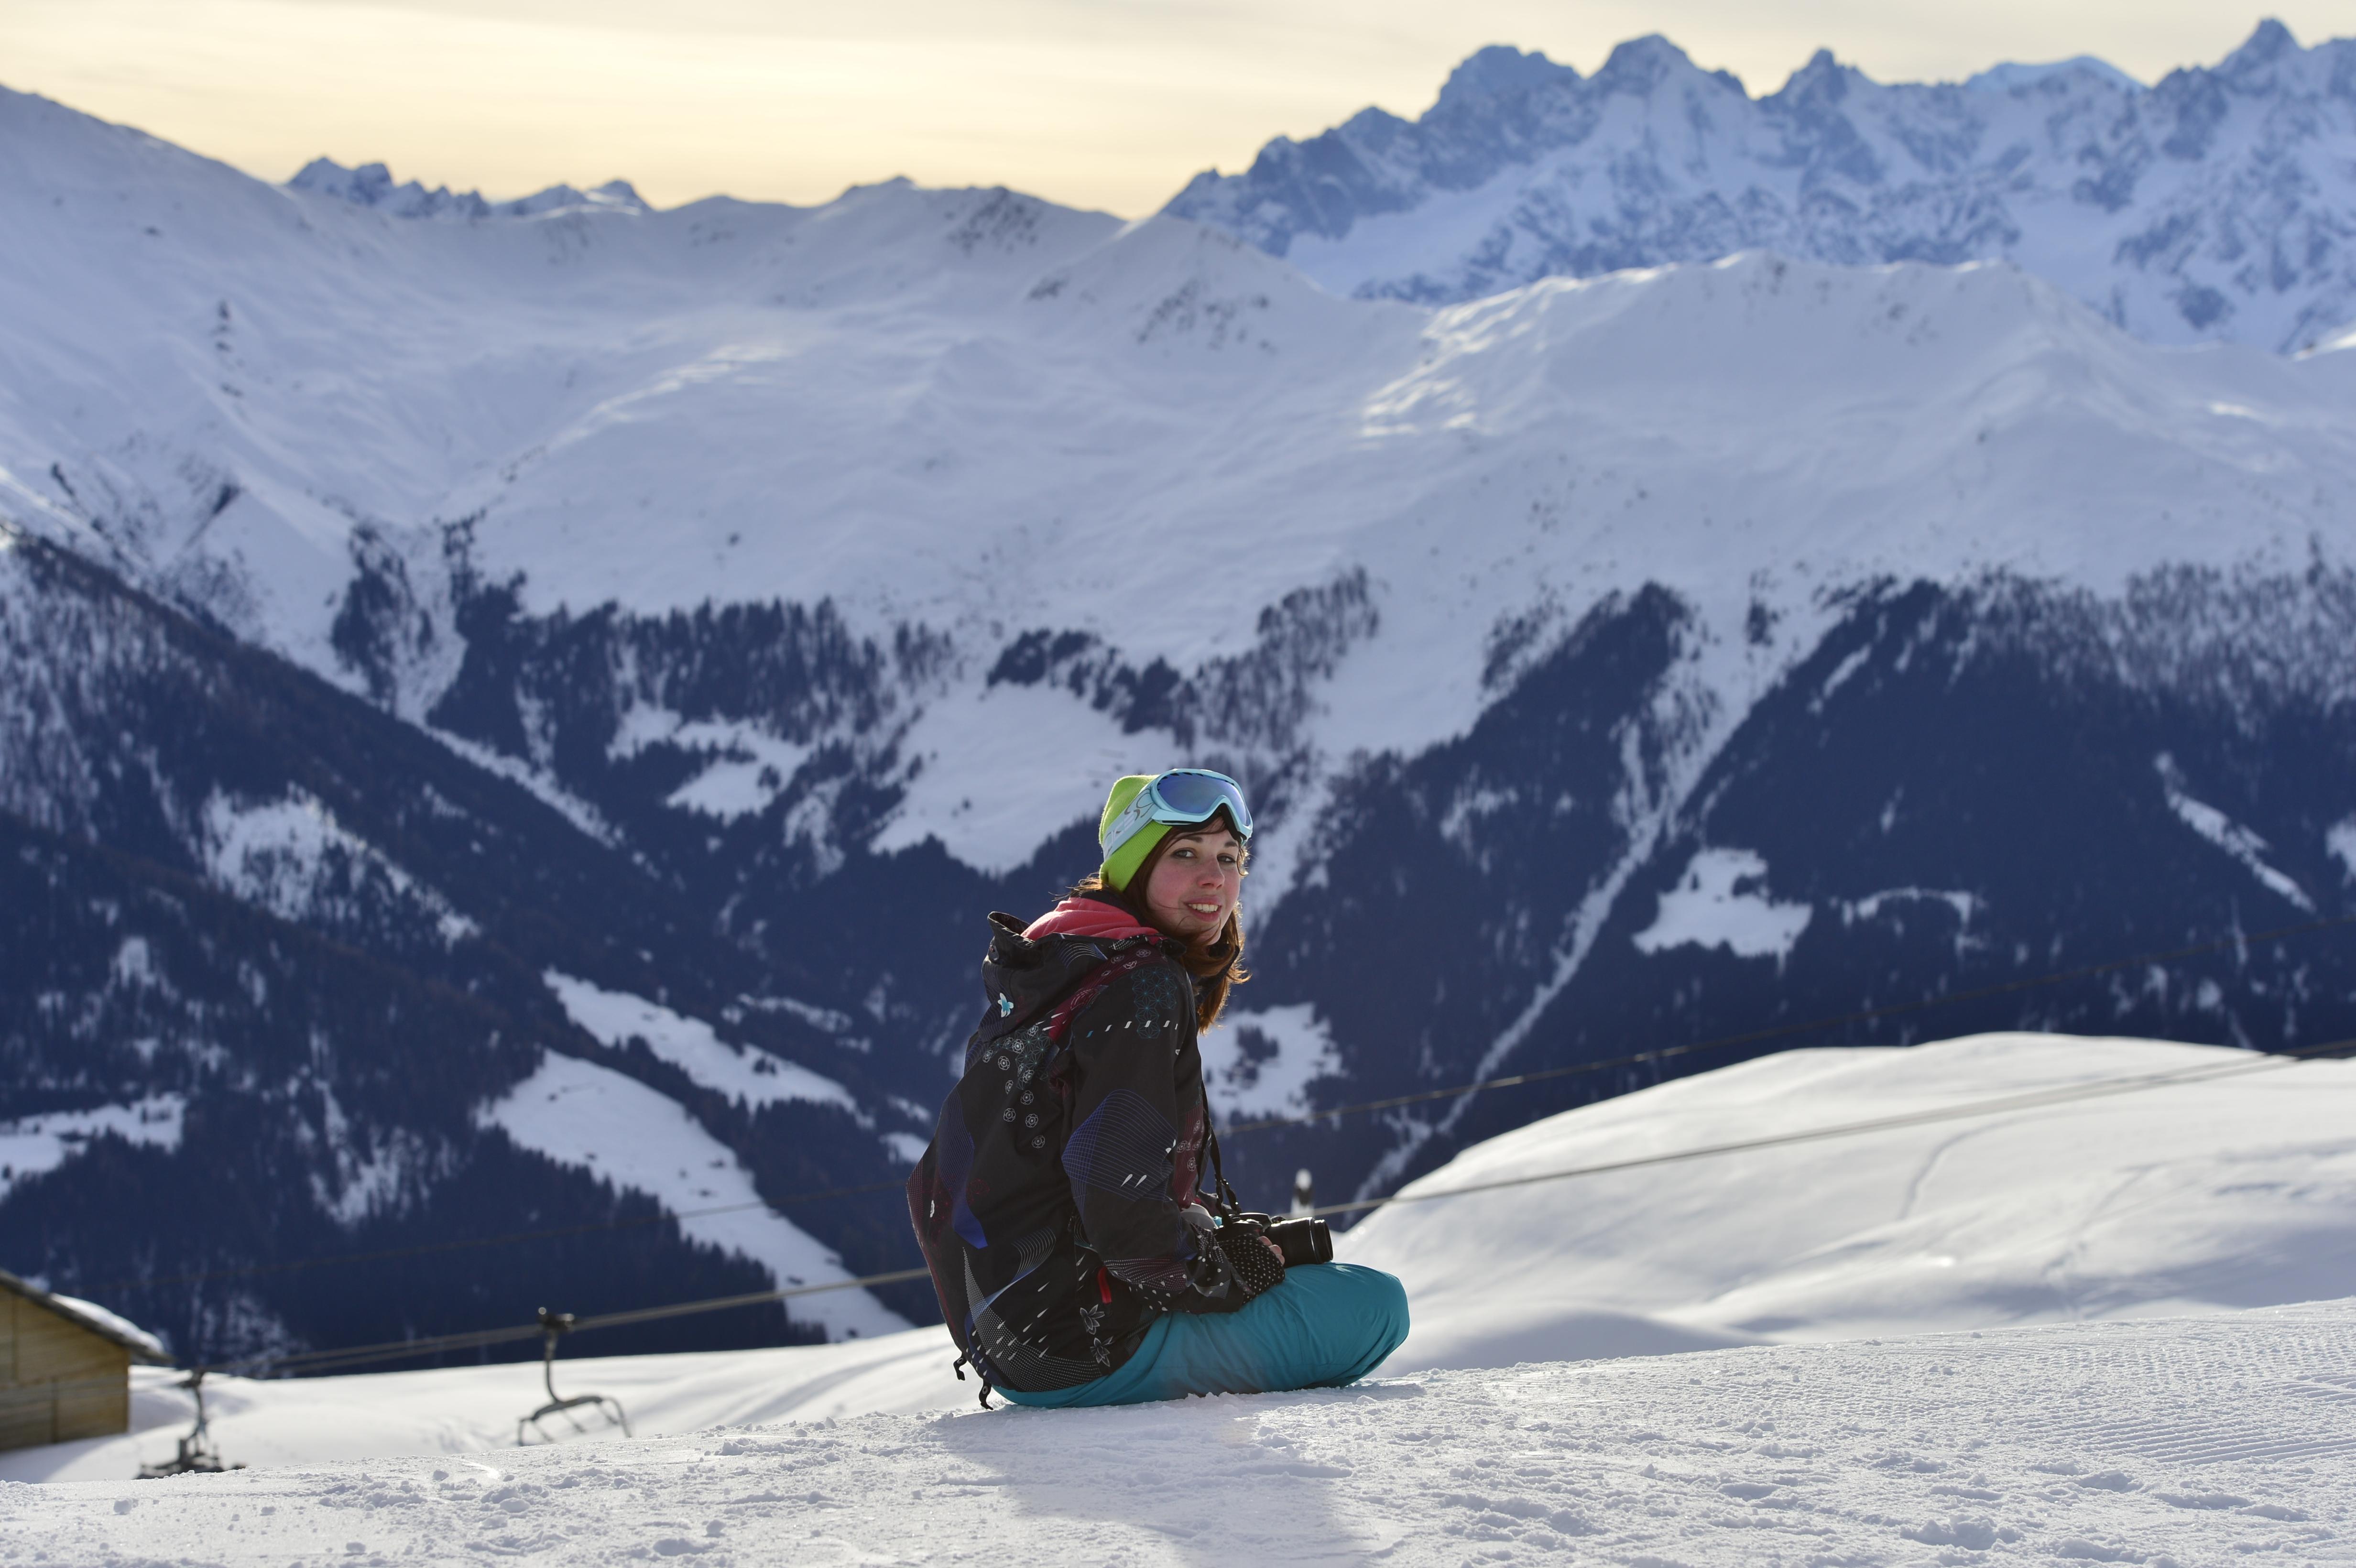 Photoblog: the ski photoshoot - the girl outdoors